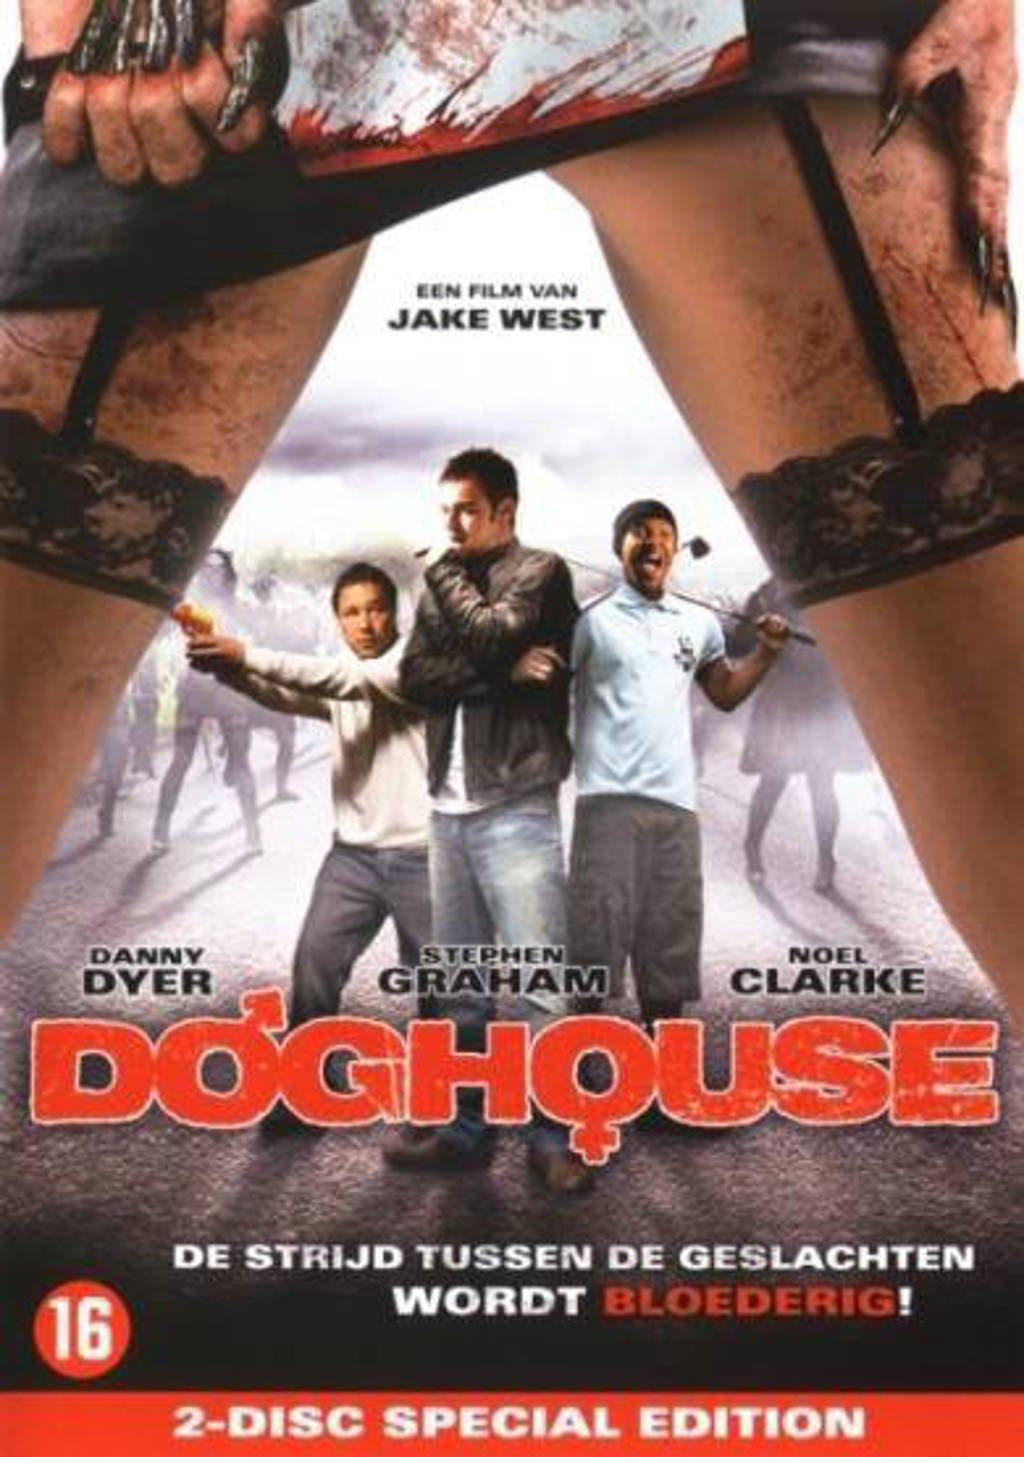 Doghouse (DVD)